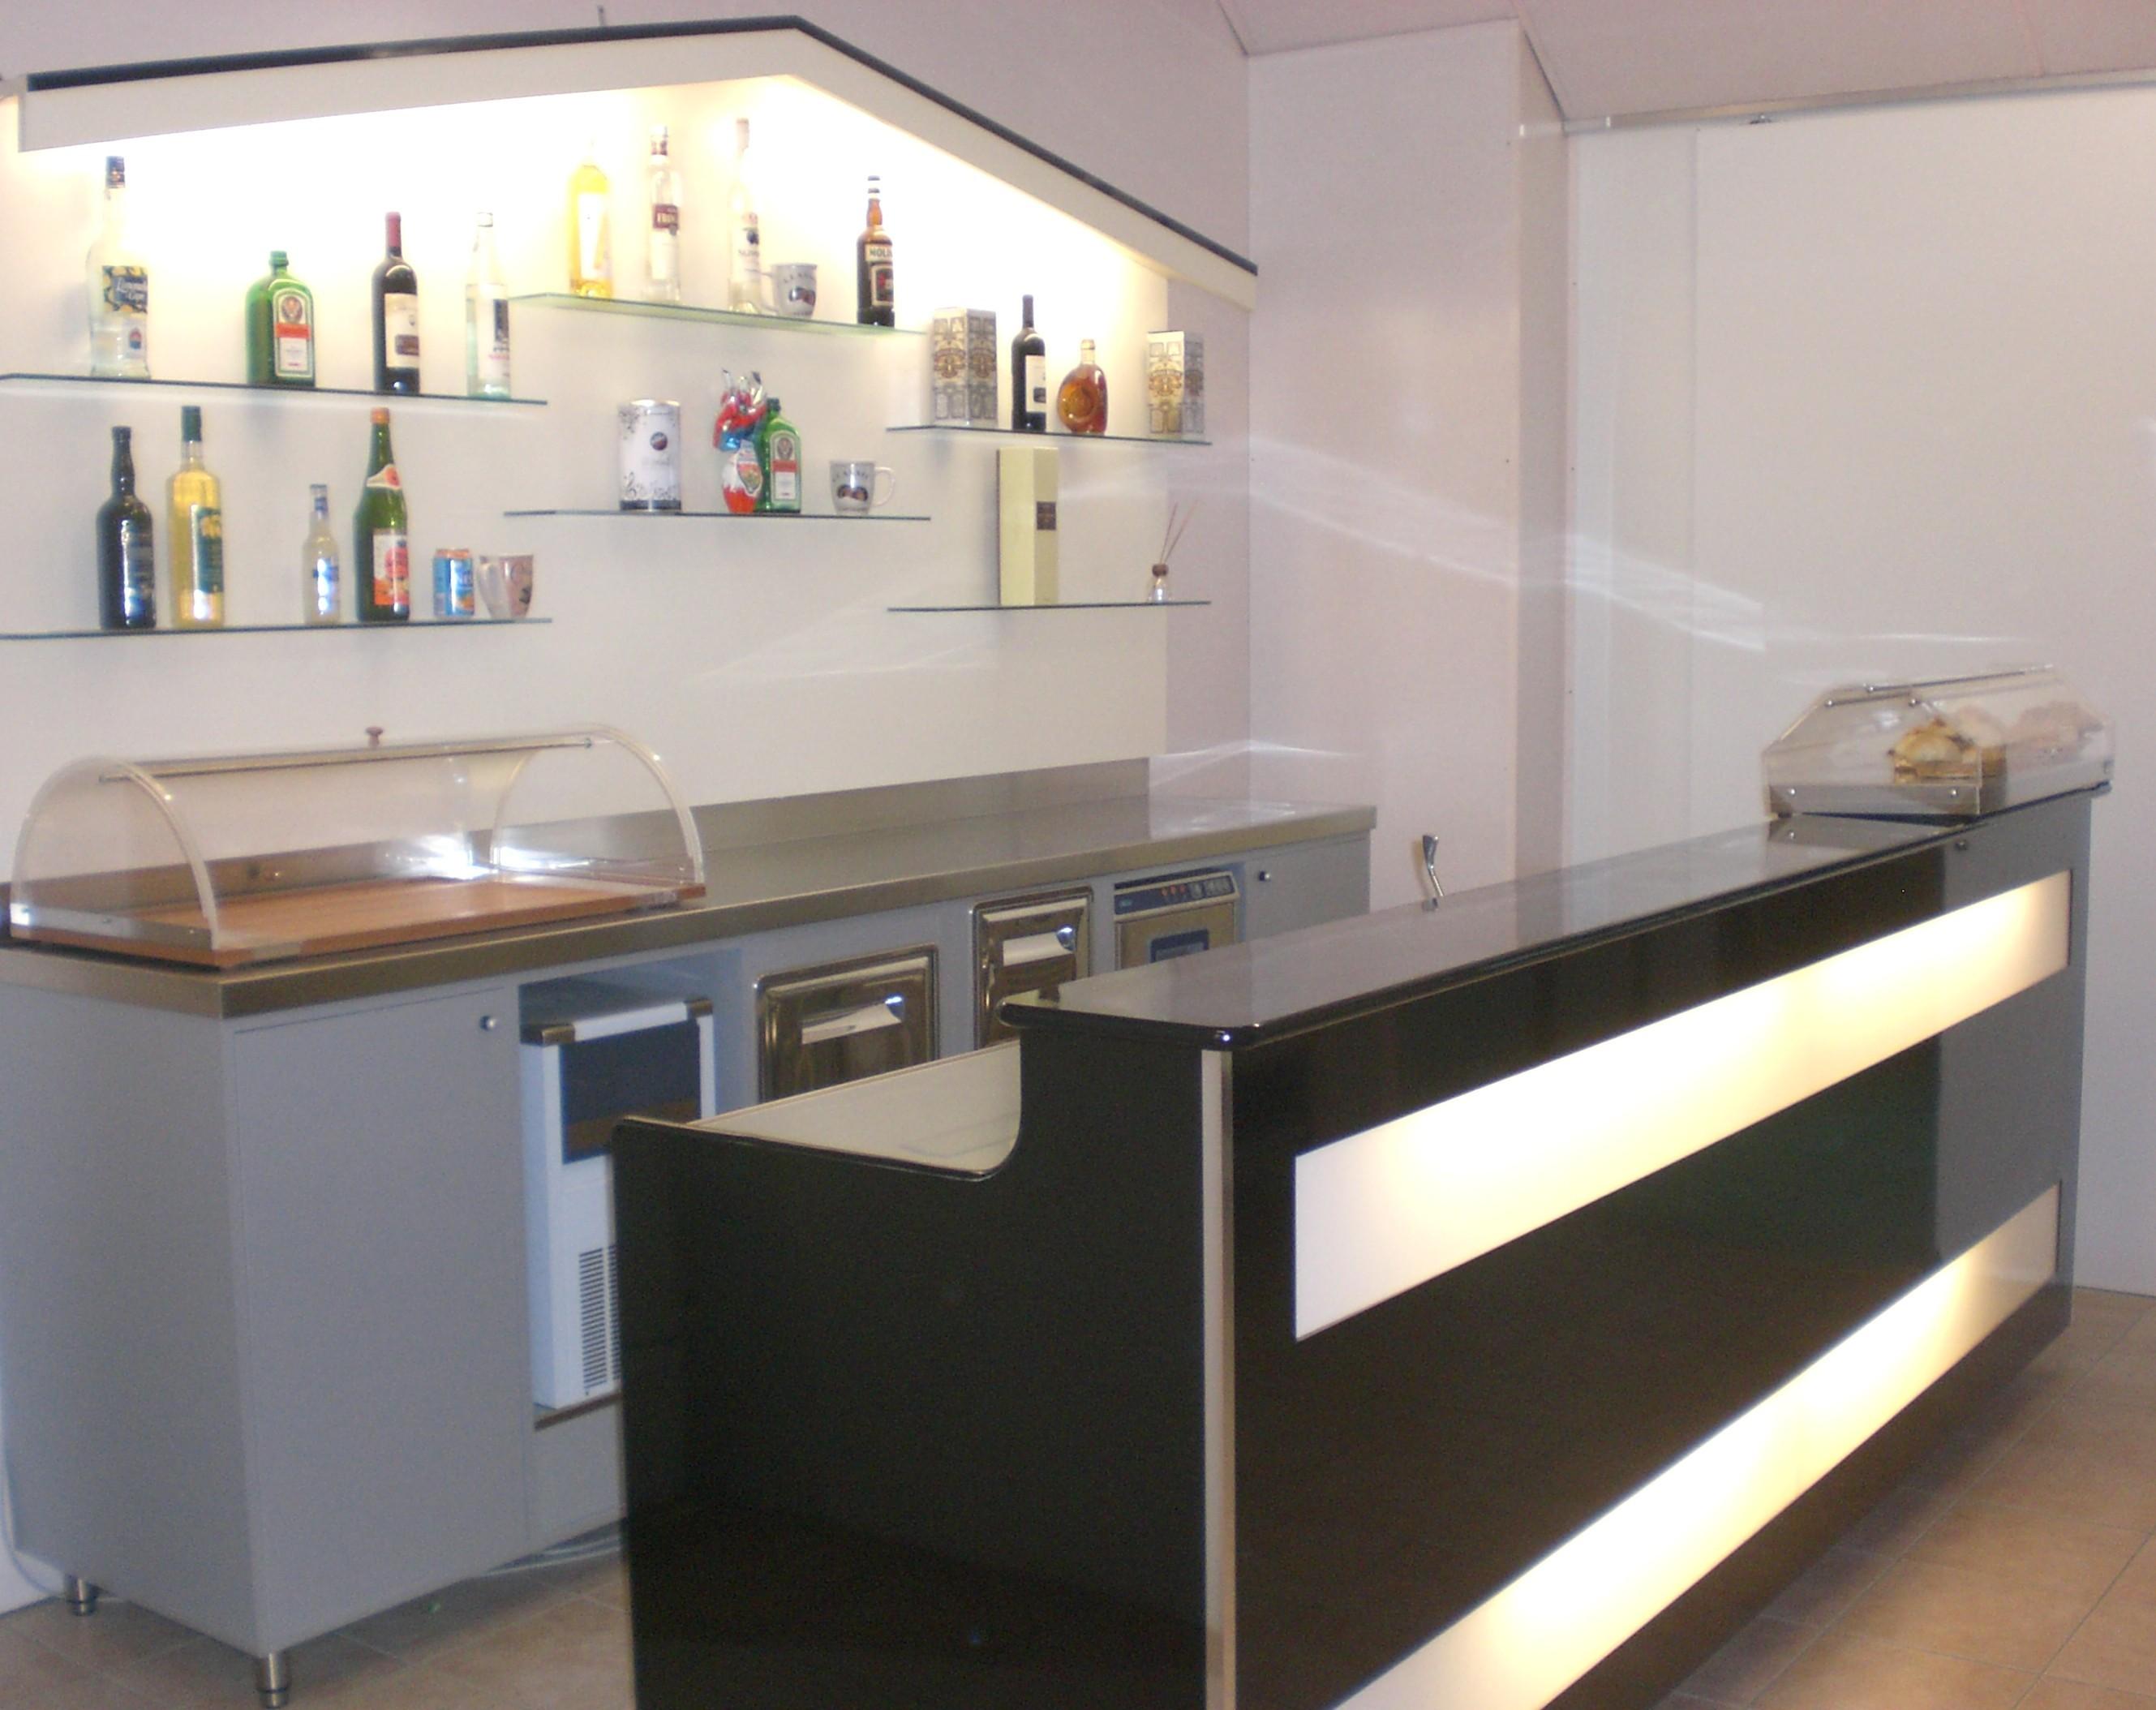 Banchi bar compra in fabbrica a met prezzo novit bar for Banconi bar usati prezzi